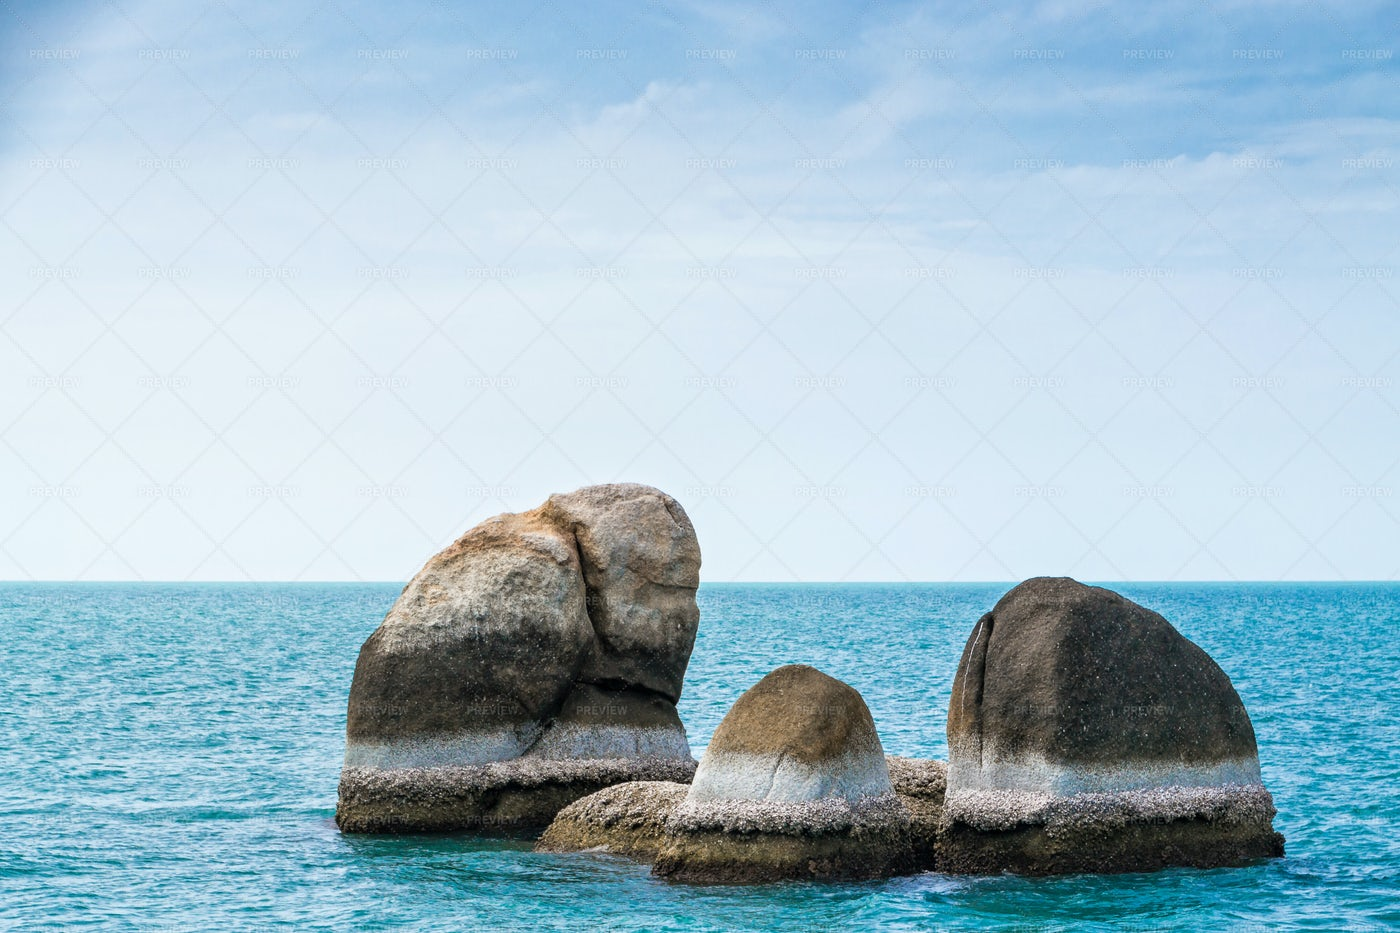 Picturesque Stones: Stock Photos